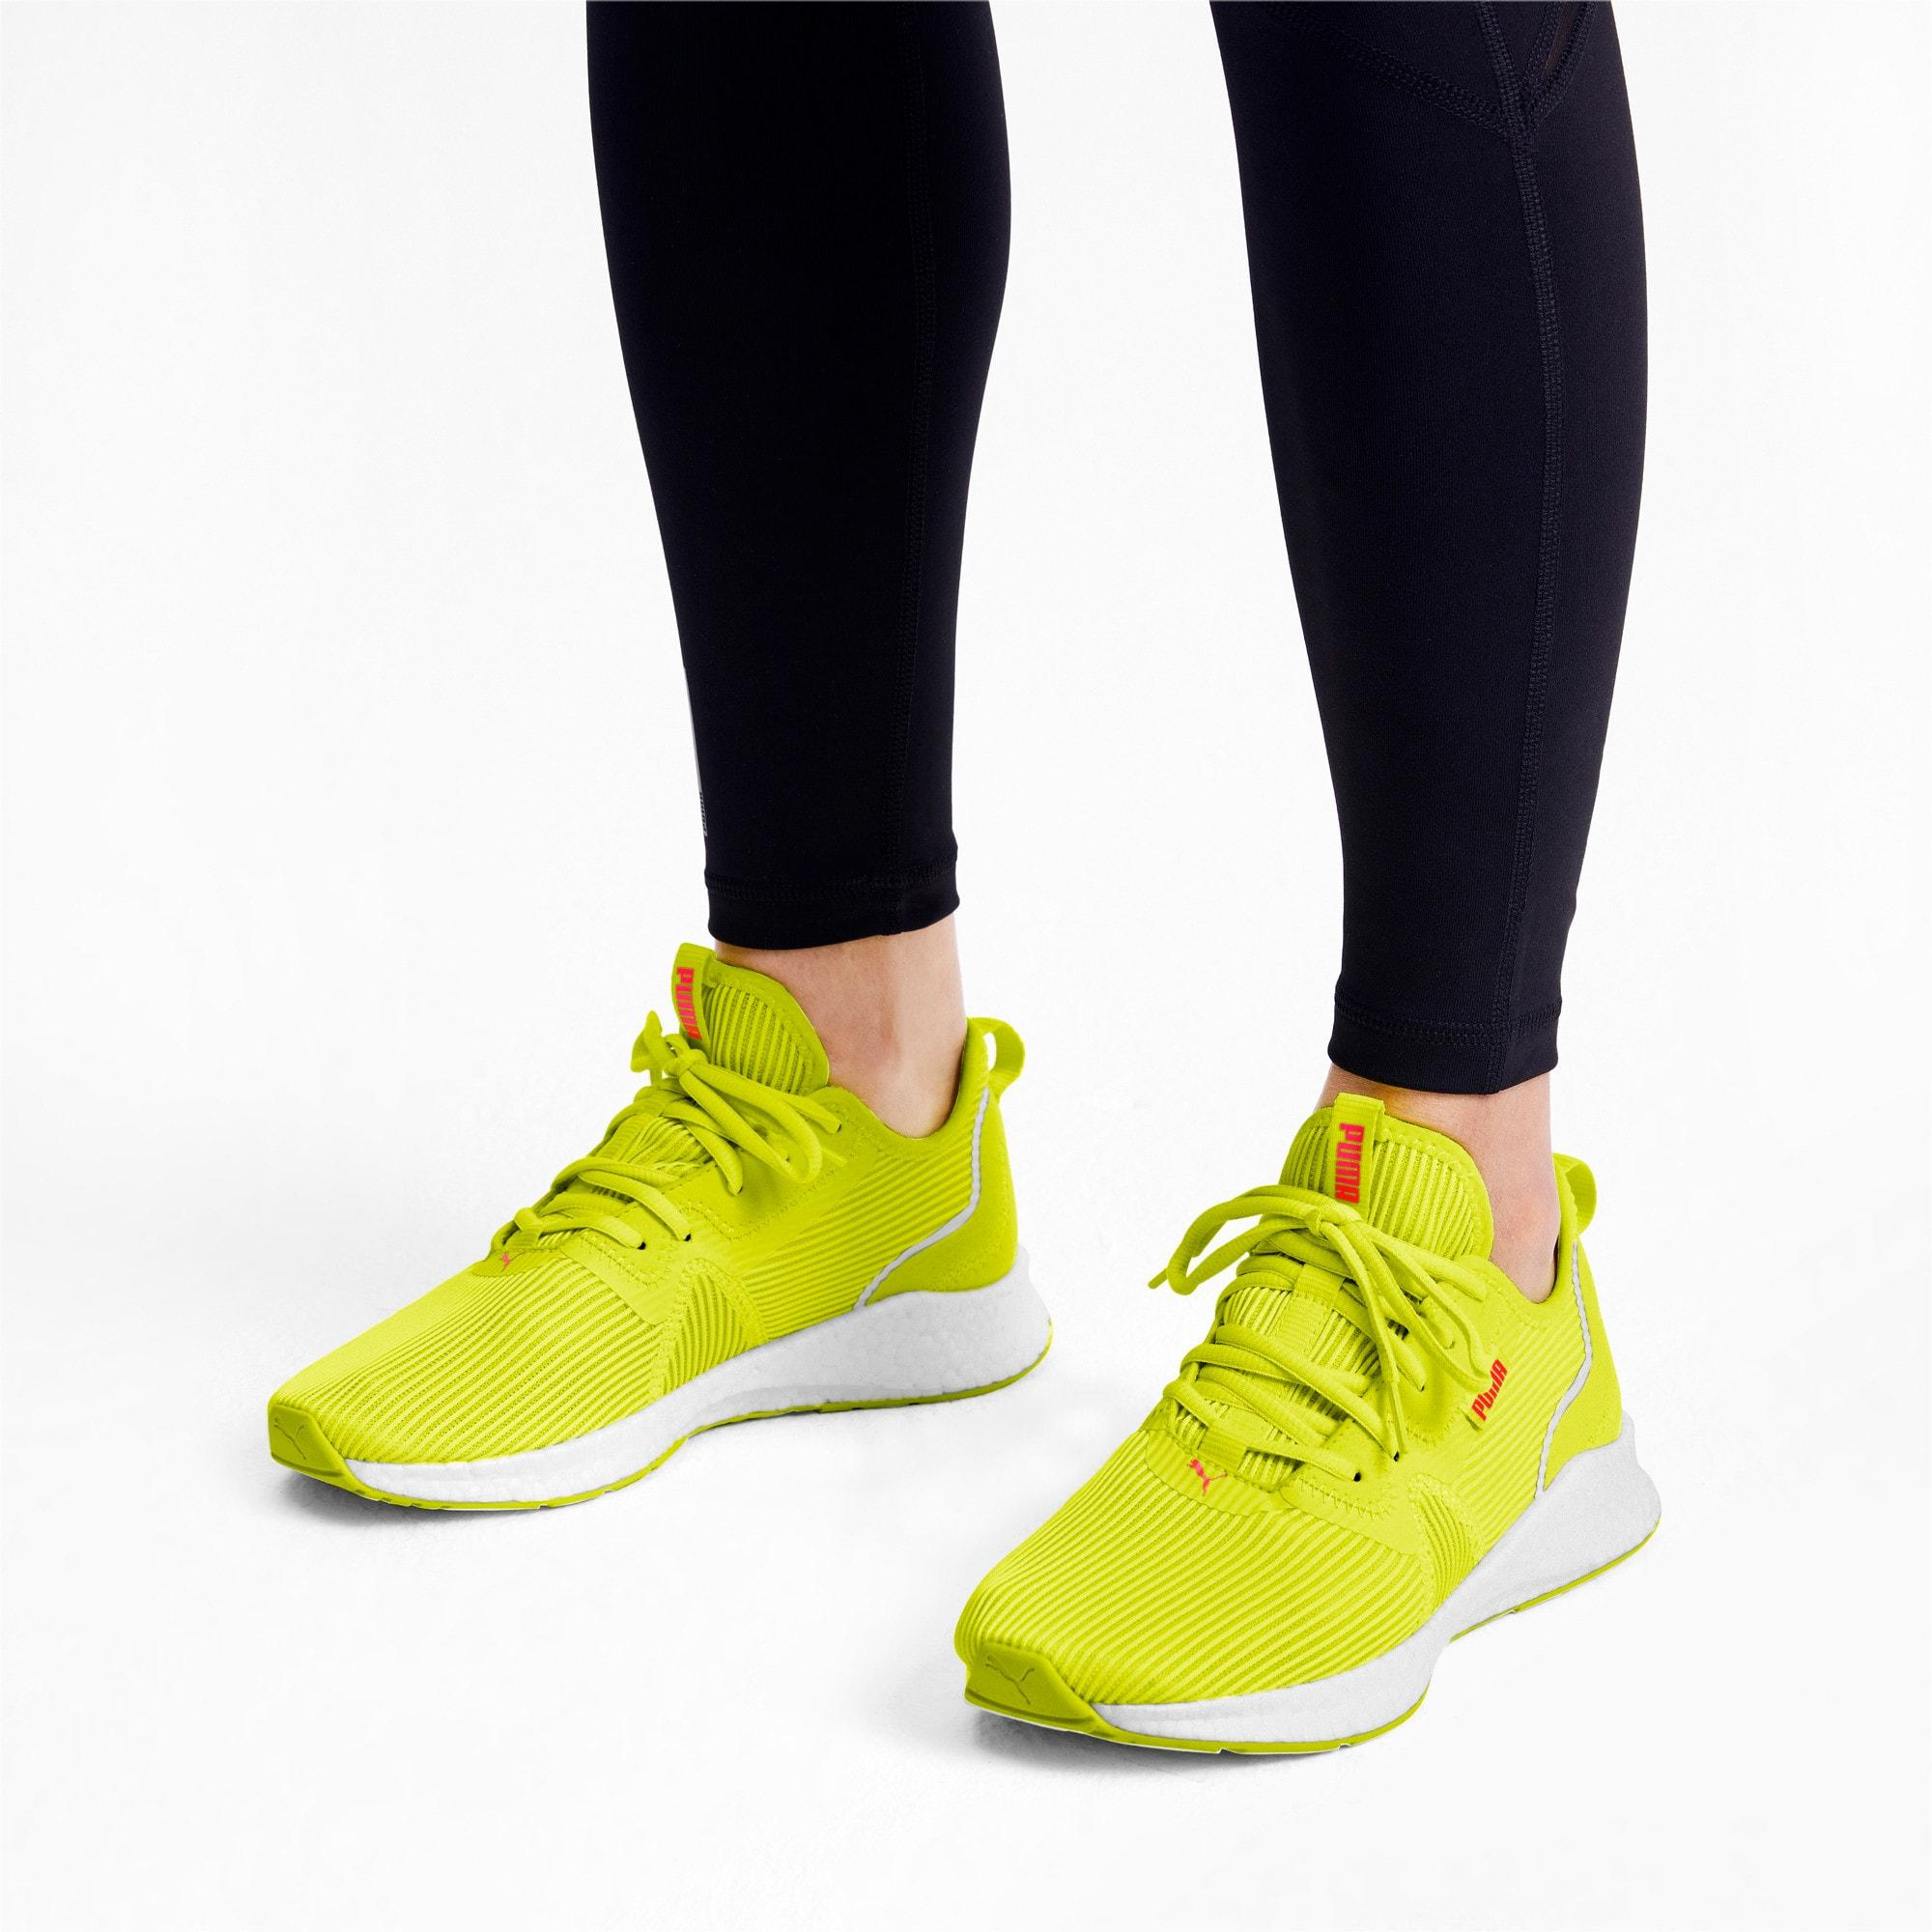 Miniatura 3 de Zapatos para correr NRGY Star Femme para mujer, Yellow Alert-Pink Alert, mediano